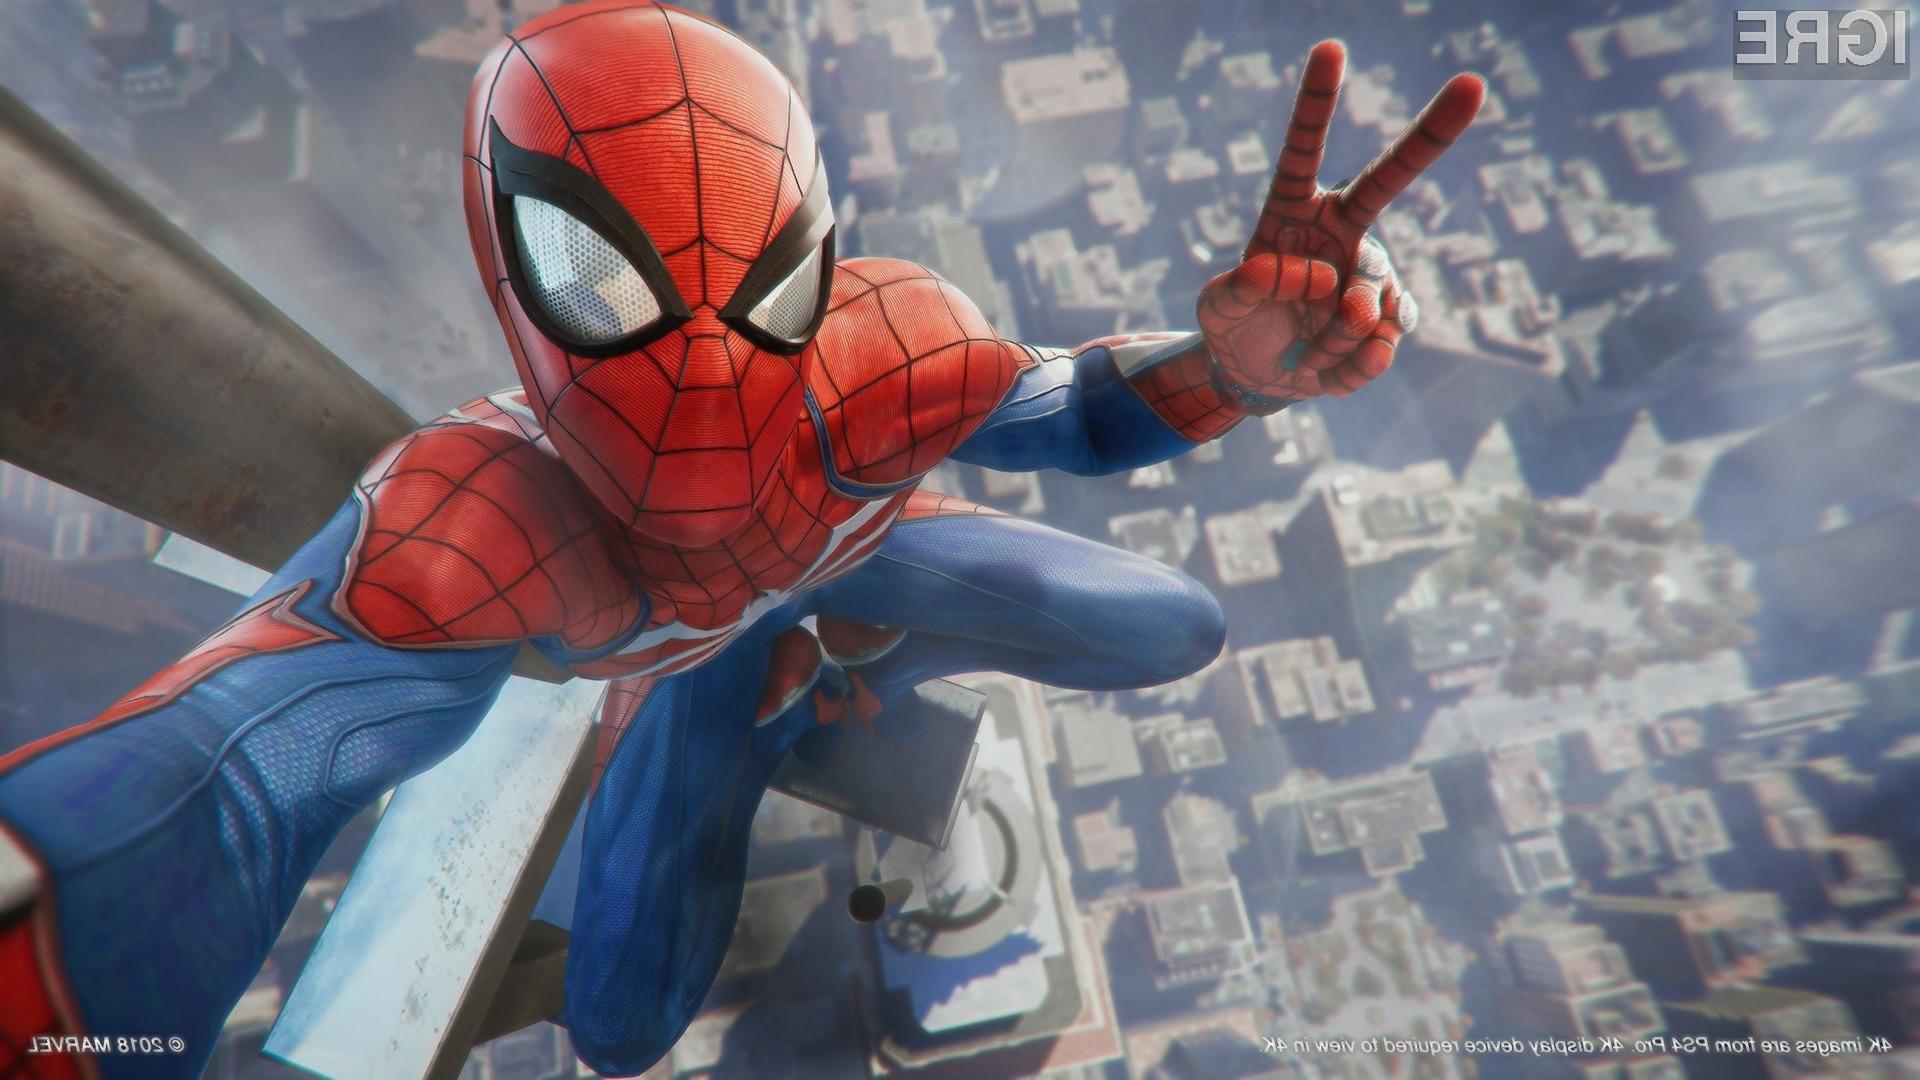 https://www.racunalniske-novice.com/igre/novice/sony/opis-igre-marvels-spiderman---neverjetna-a-ne-ultimativna-spiderman-igra.html?RSS4674a9ee216d35f61eb5dee0ab69c8e2